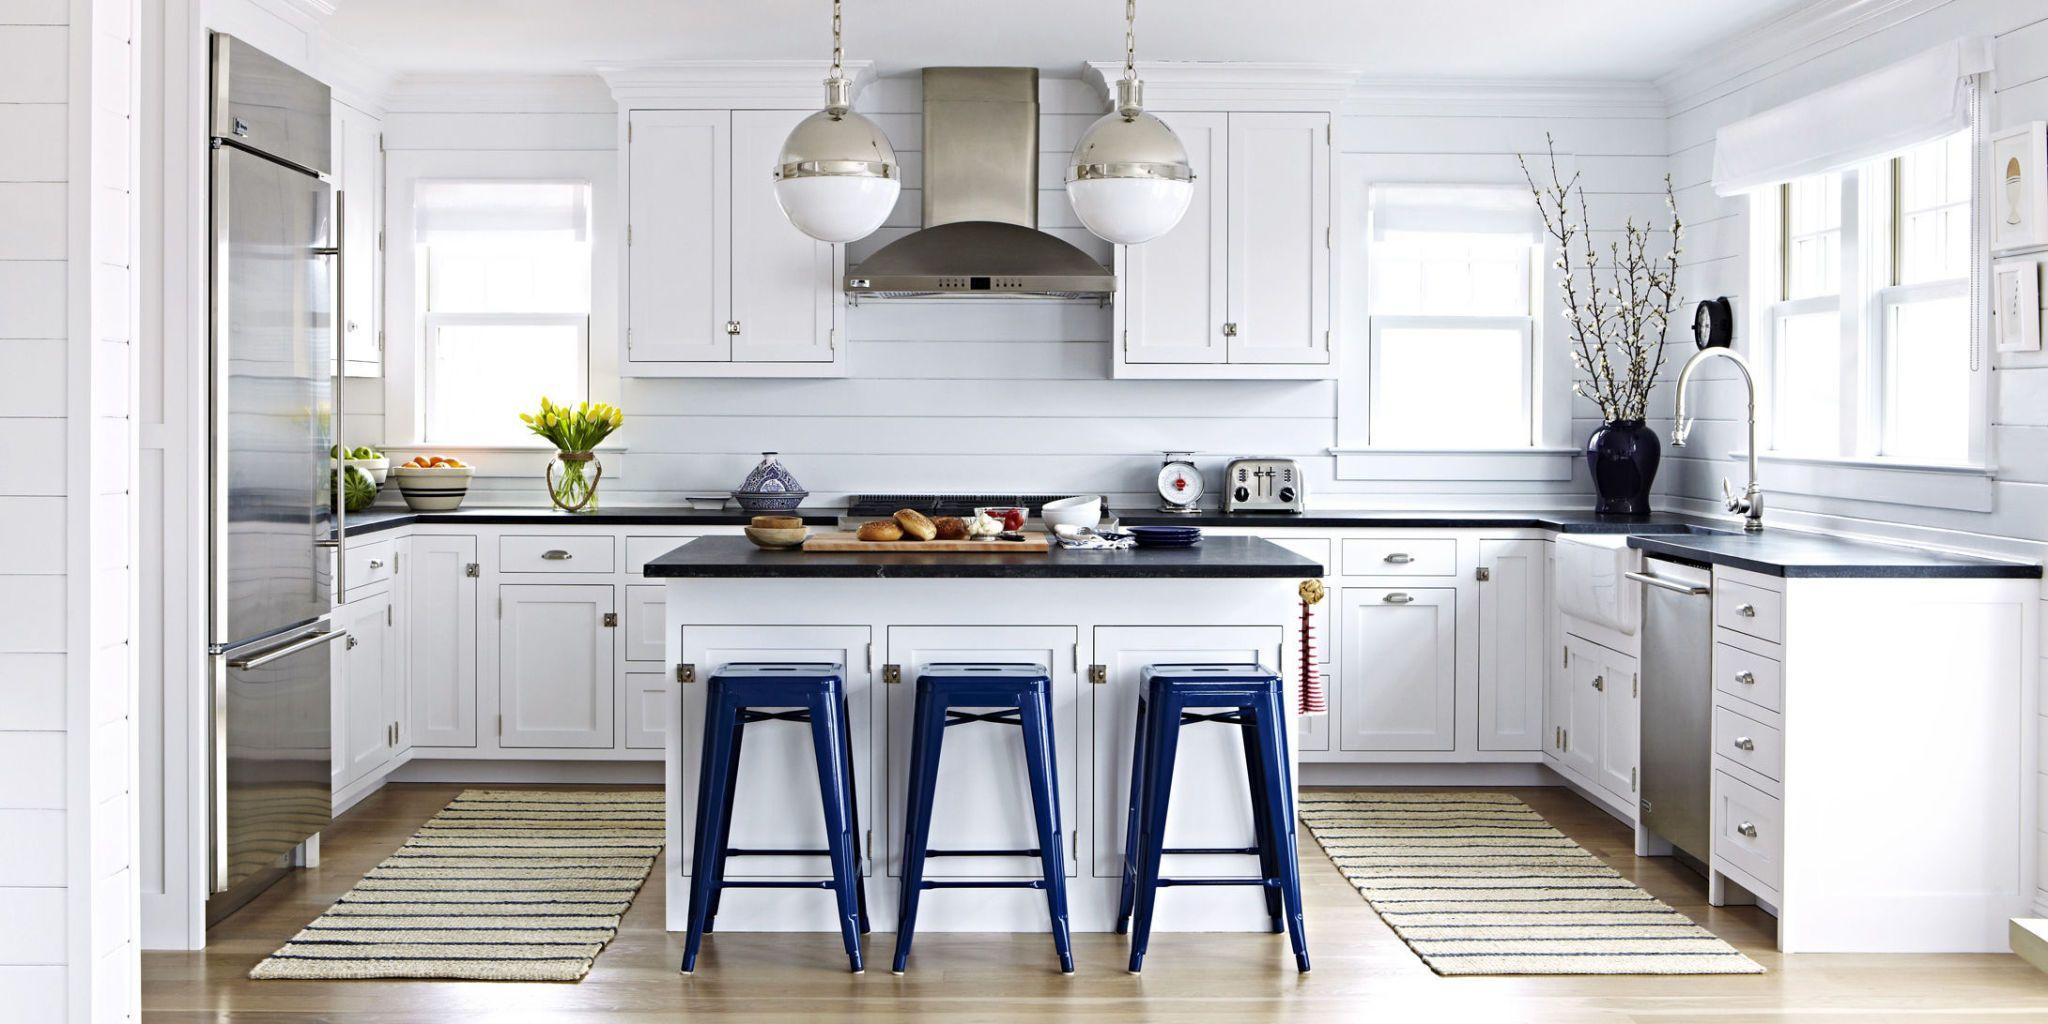 decorating kitchens kitchen update ideas 40 best decor and for design